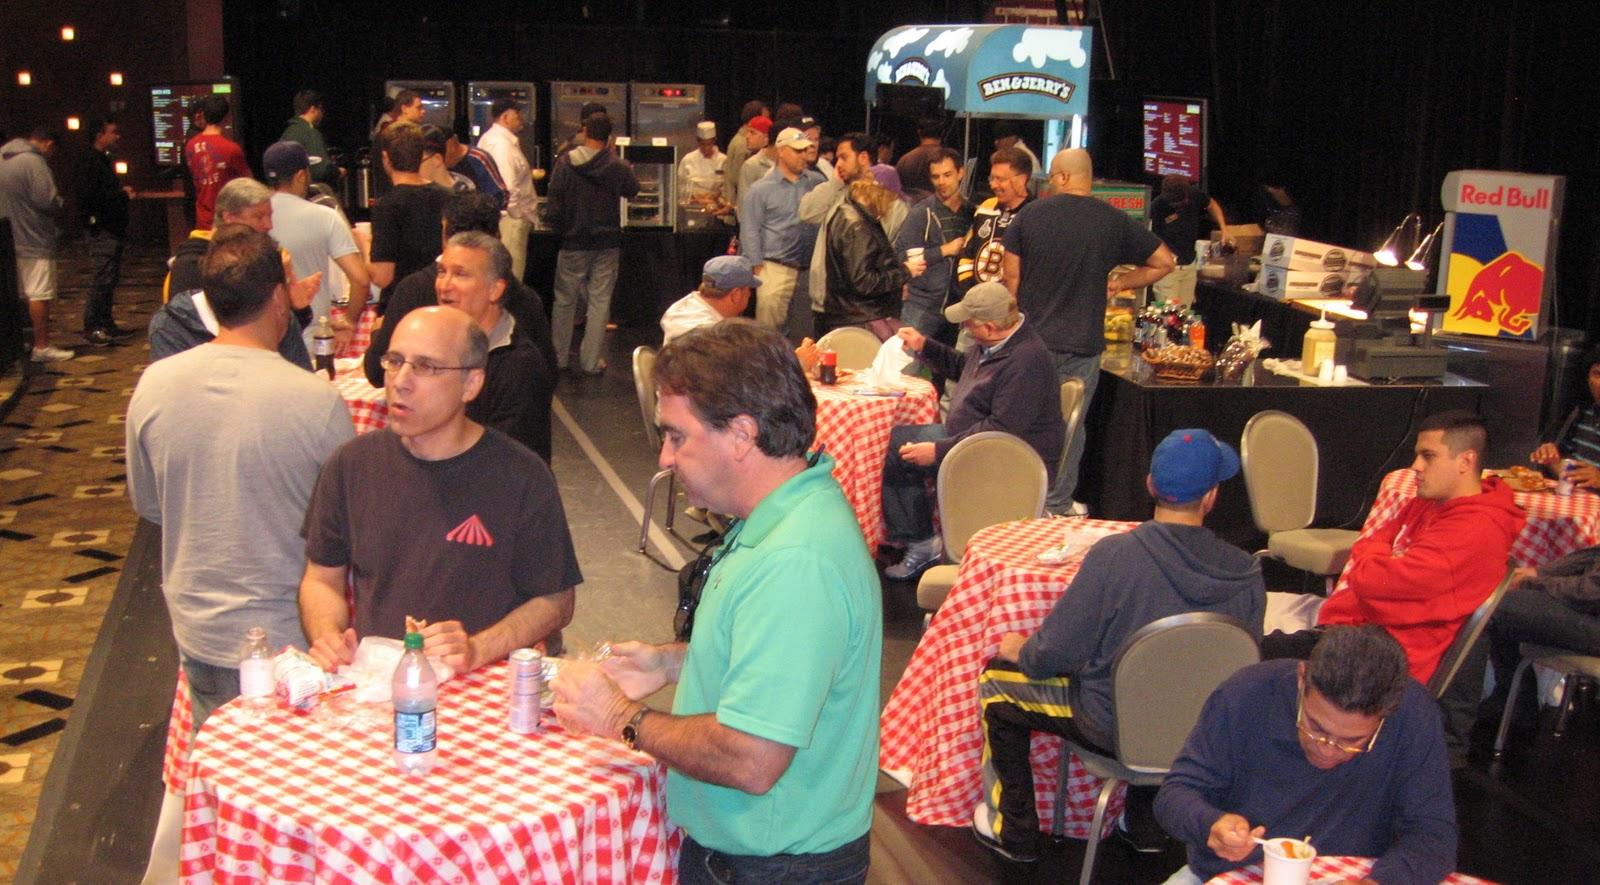 Borgata Poker Room Live Report